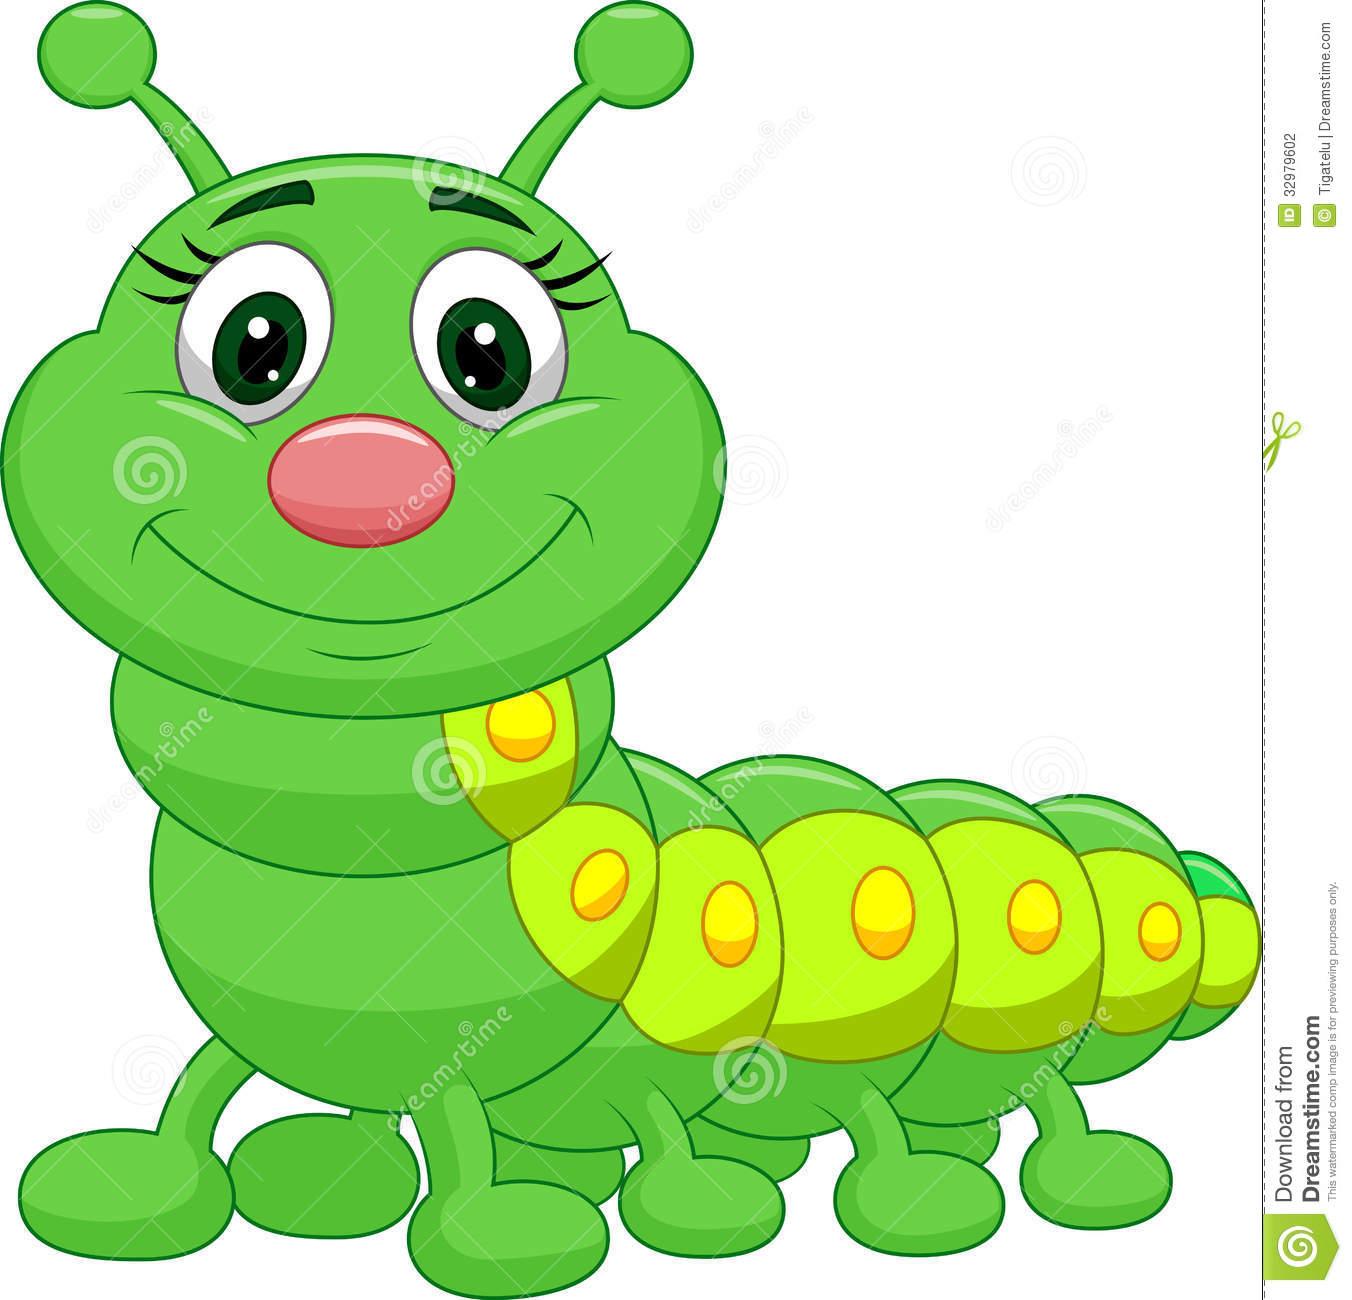 Catepillar clipart clipart clip royalty free download Baby Caterpillars Clipart - Clipart Kid clip royalty free download